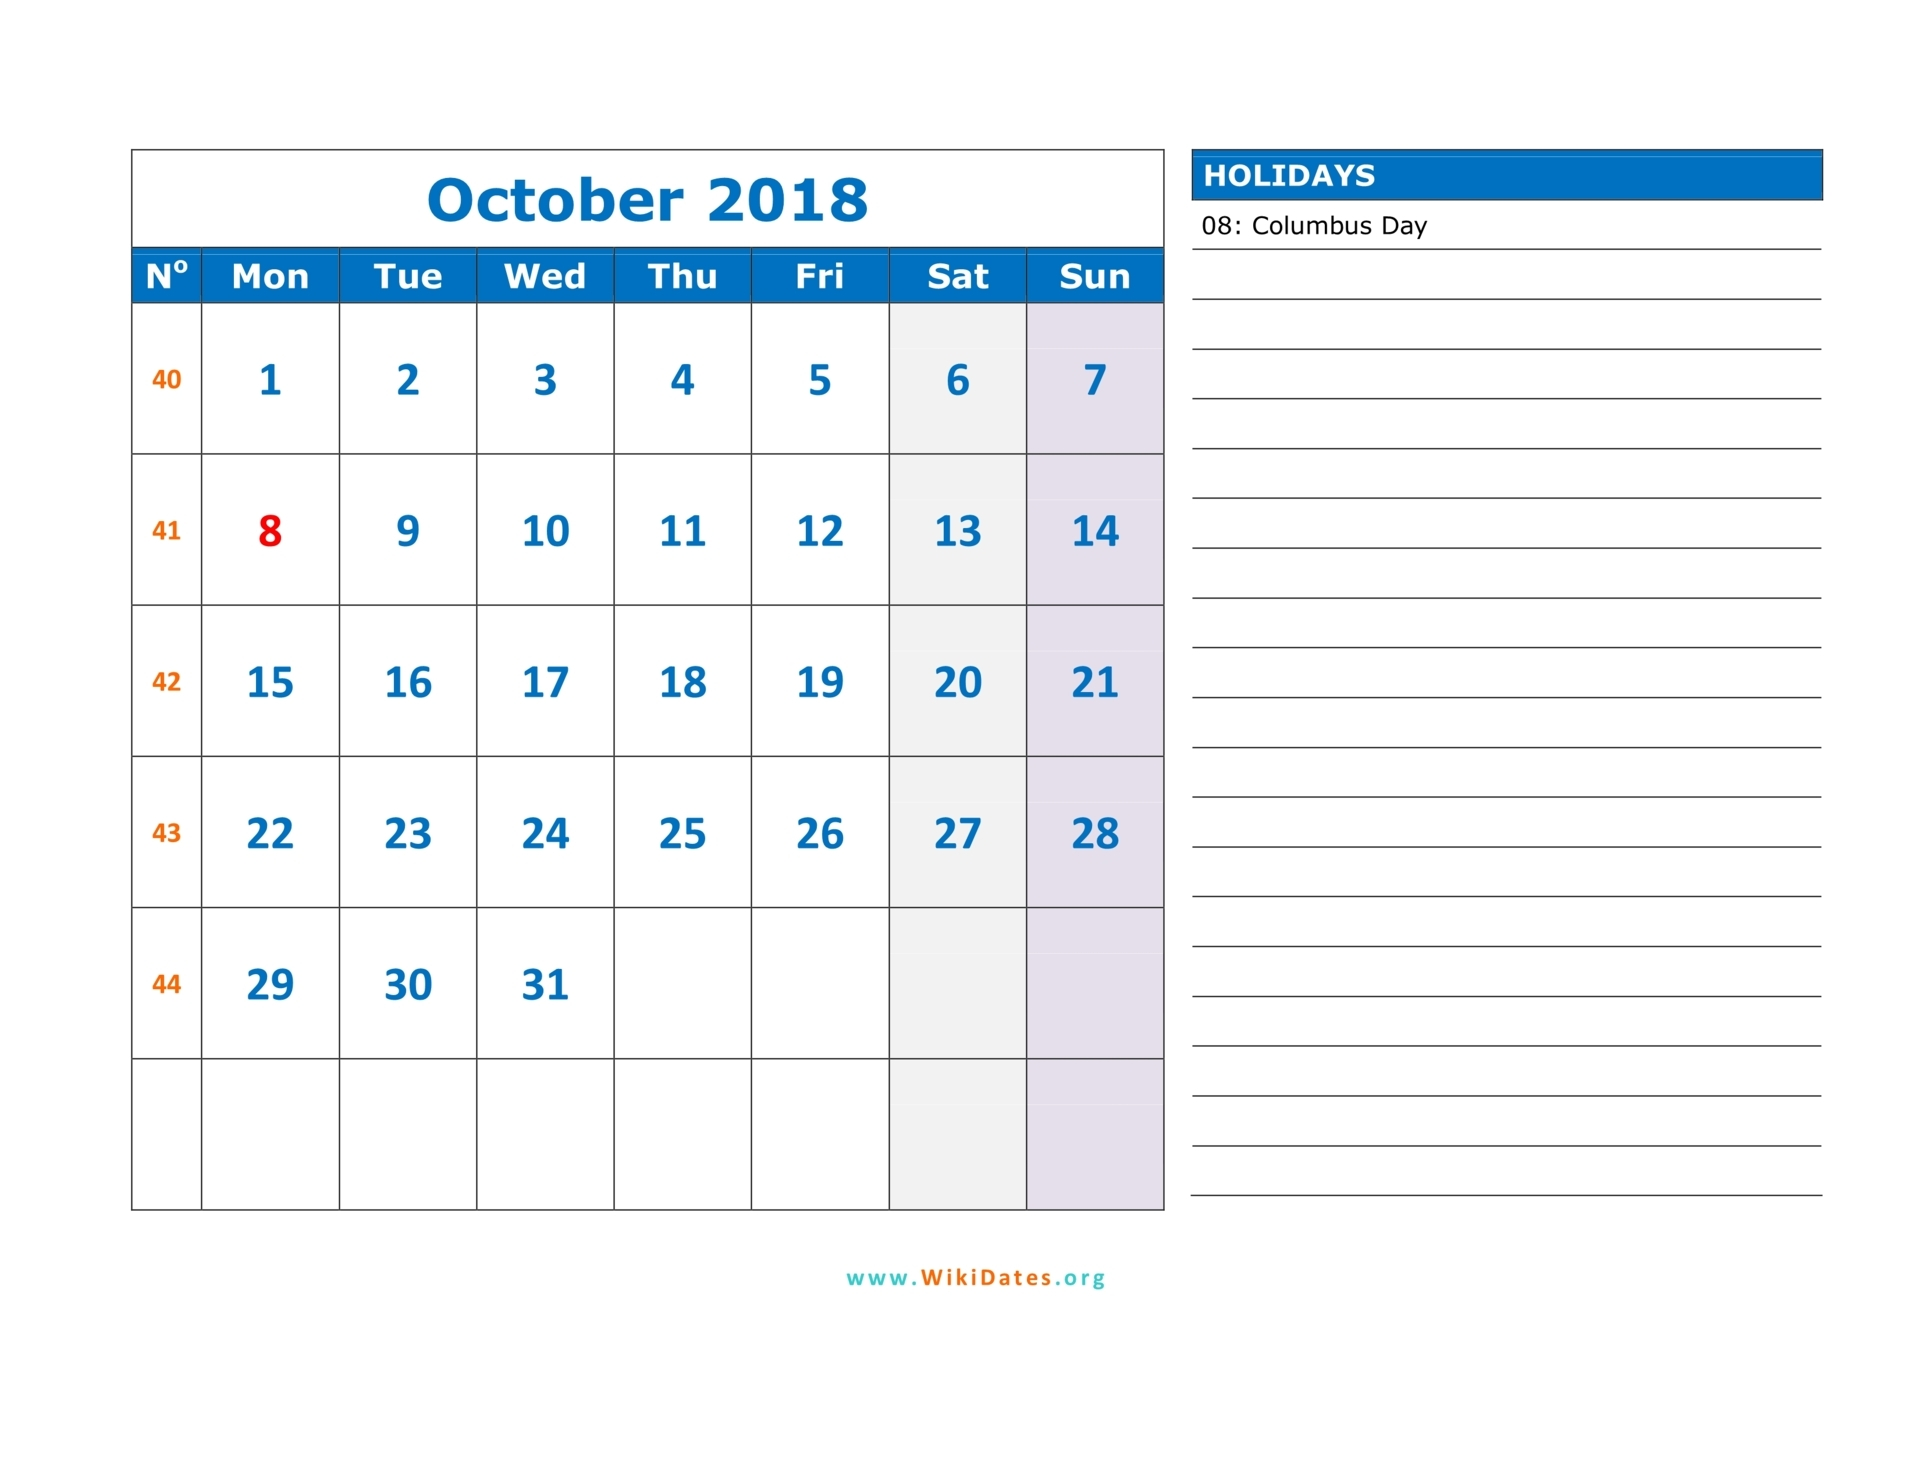 October 2018 Calendar WikiDates Org